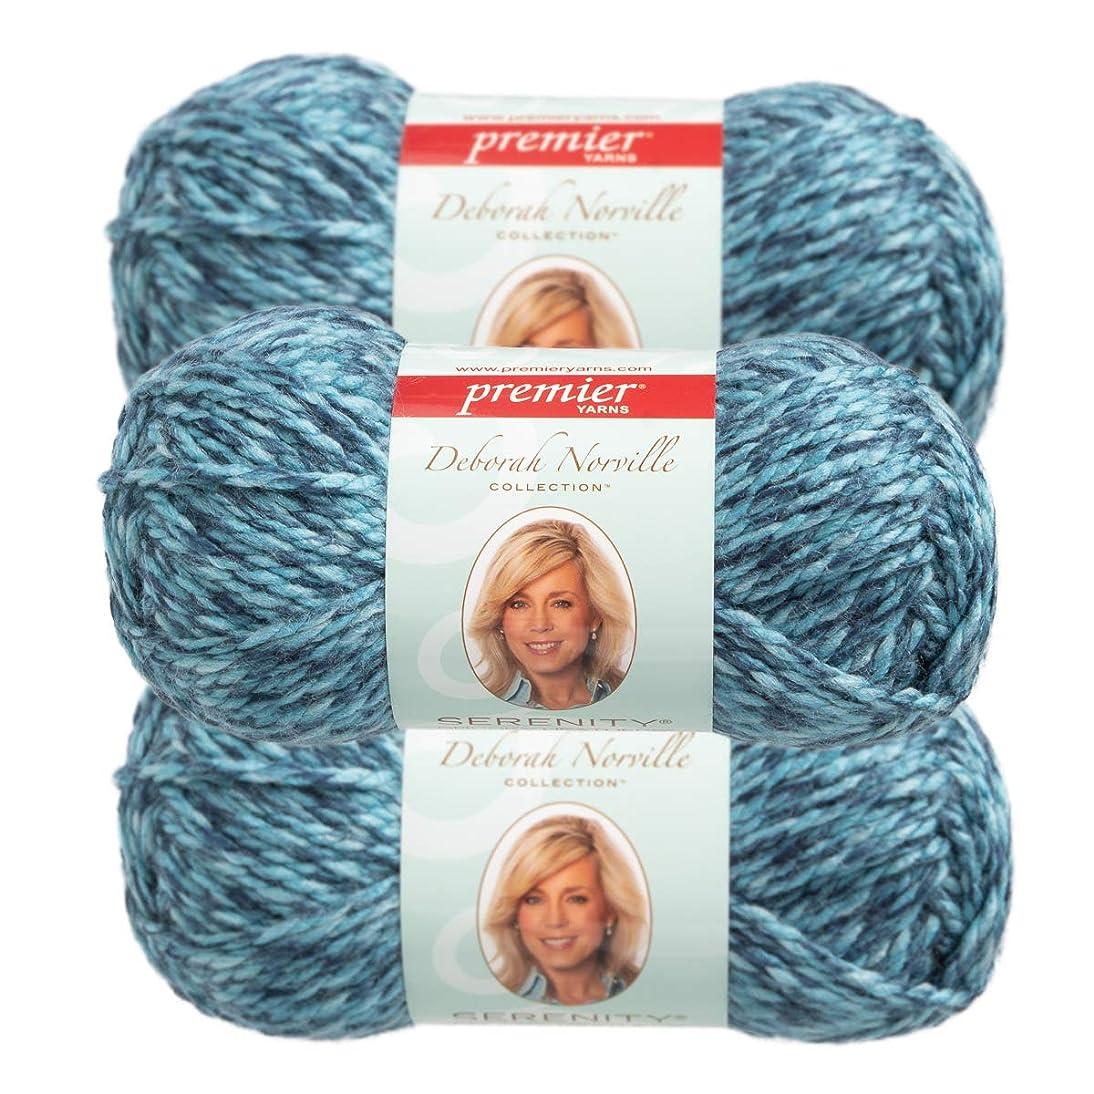 Premier Yarns (3 Pack Deborah Norville Serenity 100% Acrylic Soft Sky Heather Dark Blue Light Blue Yarn for Knitting Crocheting Chunky #5